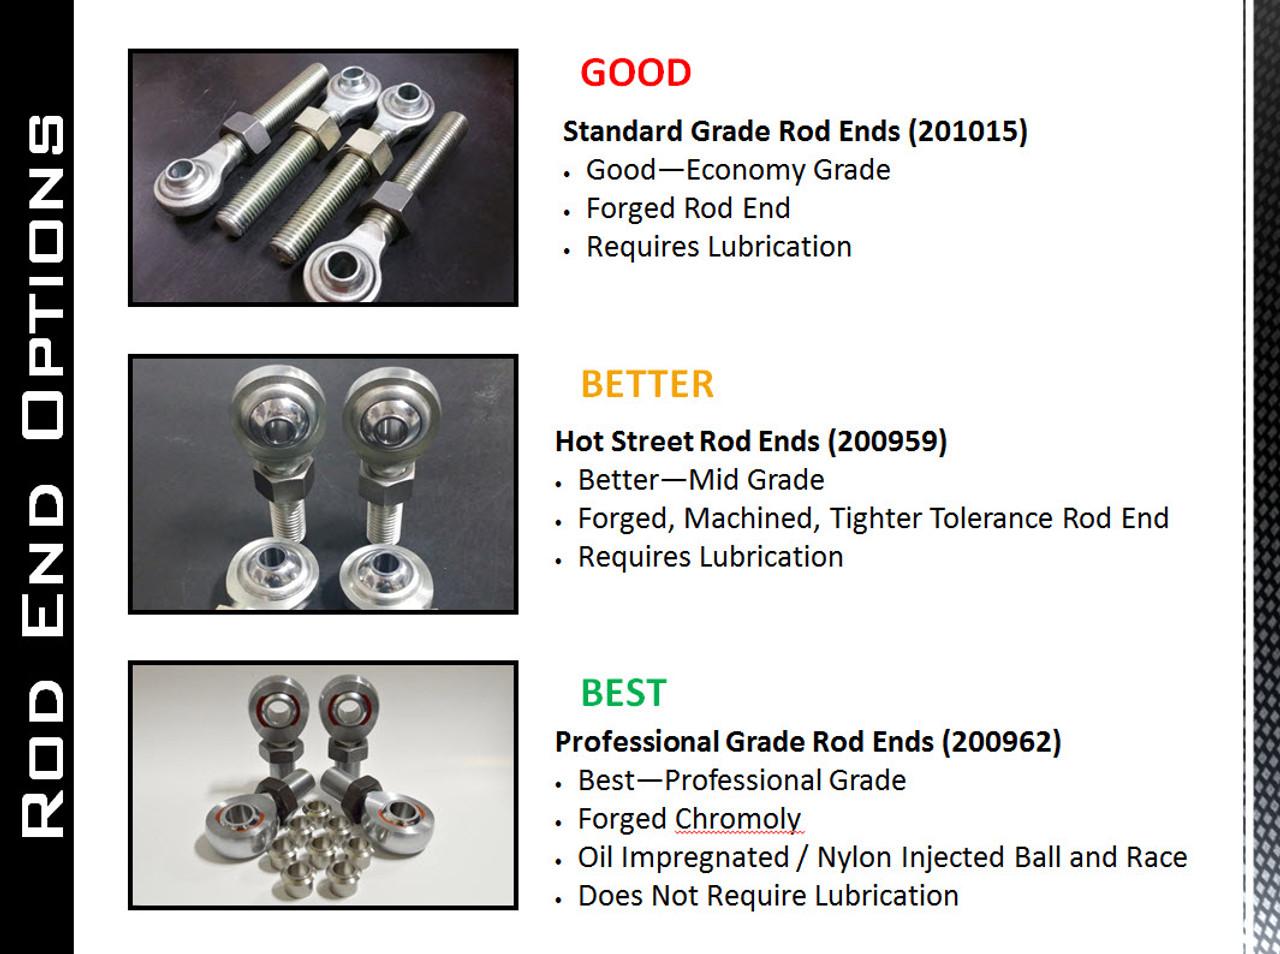 2011+ | Duramax | Bolt on Duramax Traction Bar Kit | Professional Grade Rod Ends |  Short Bed | 201038-72